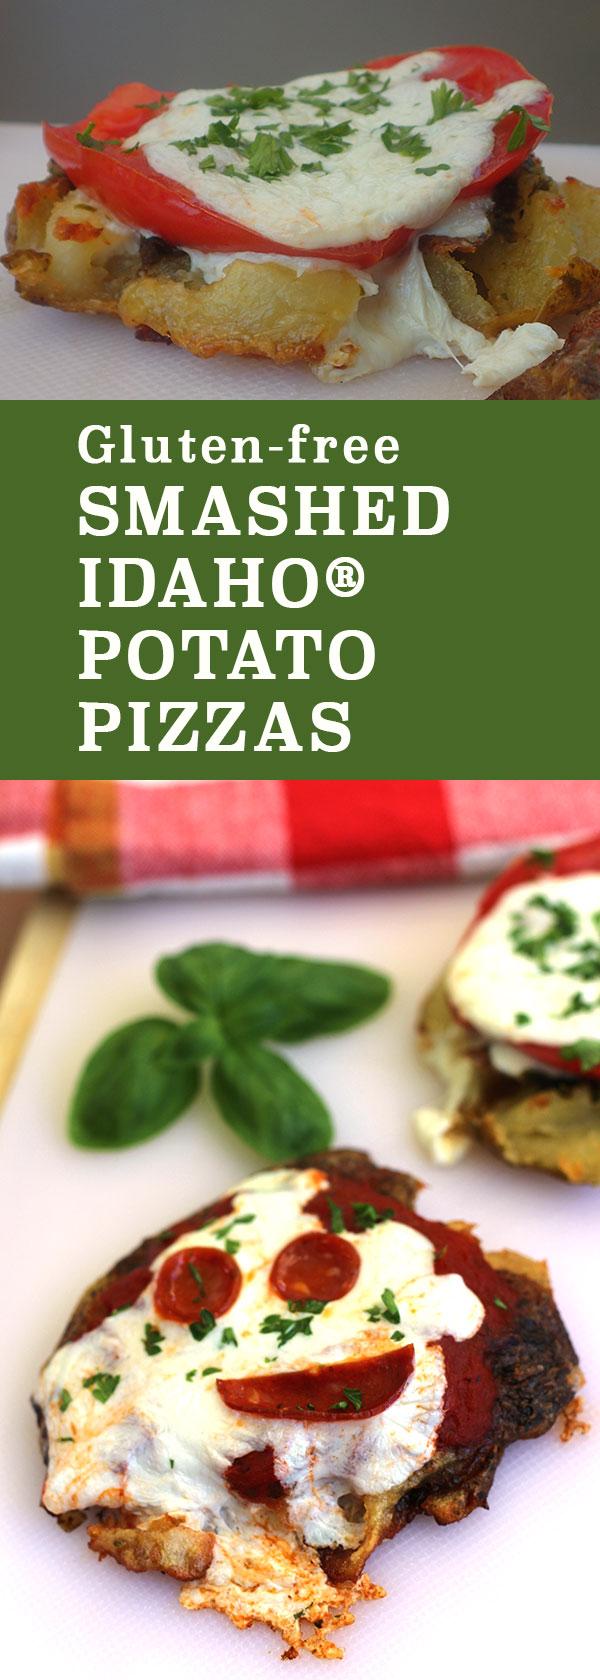 Gluten-free Smashed Idaho Potato Pizzas - perfect for back to school   diabeticfoodie.com